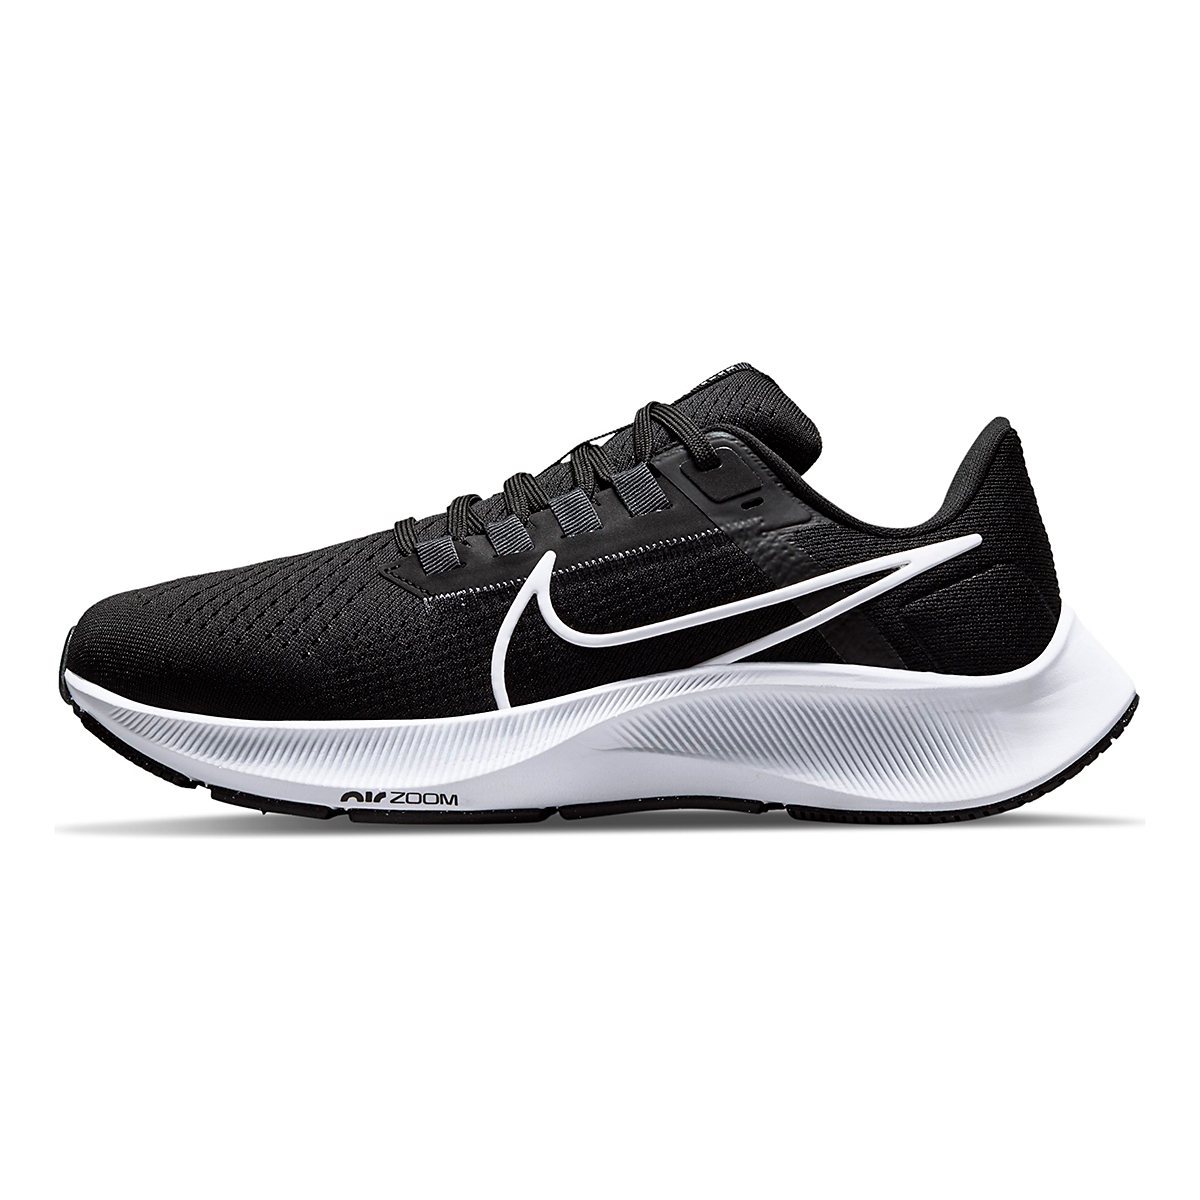 Women's Nike Air Zoom Pegasus 38 Running Shoe - Color: Black/White/Anthracite - Size: 5 - Width: Regular, Black/White/Anthracite, large, image 2